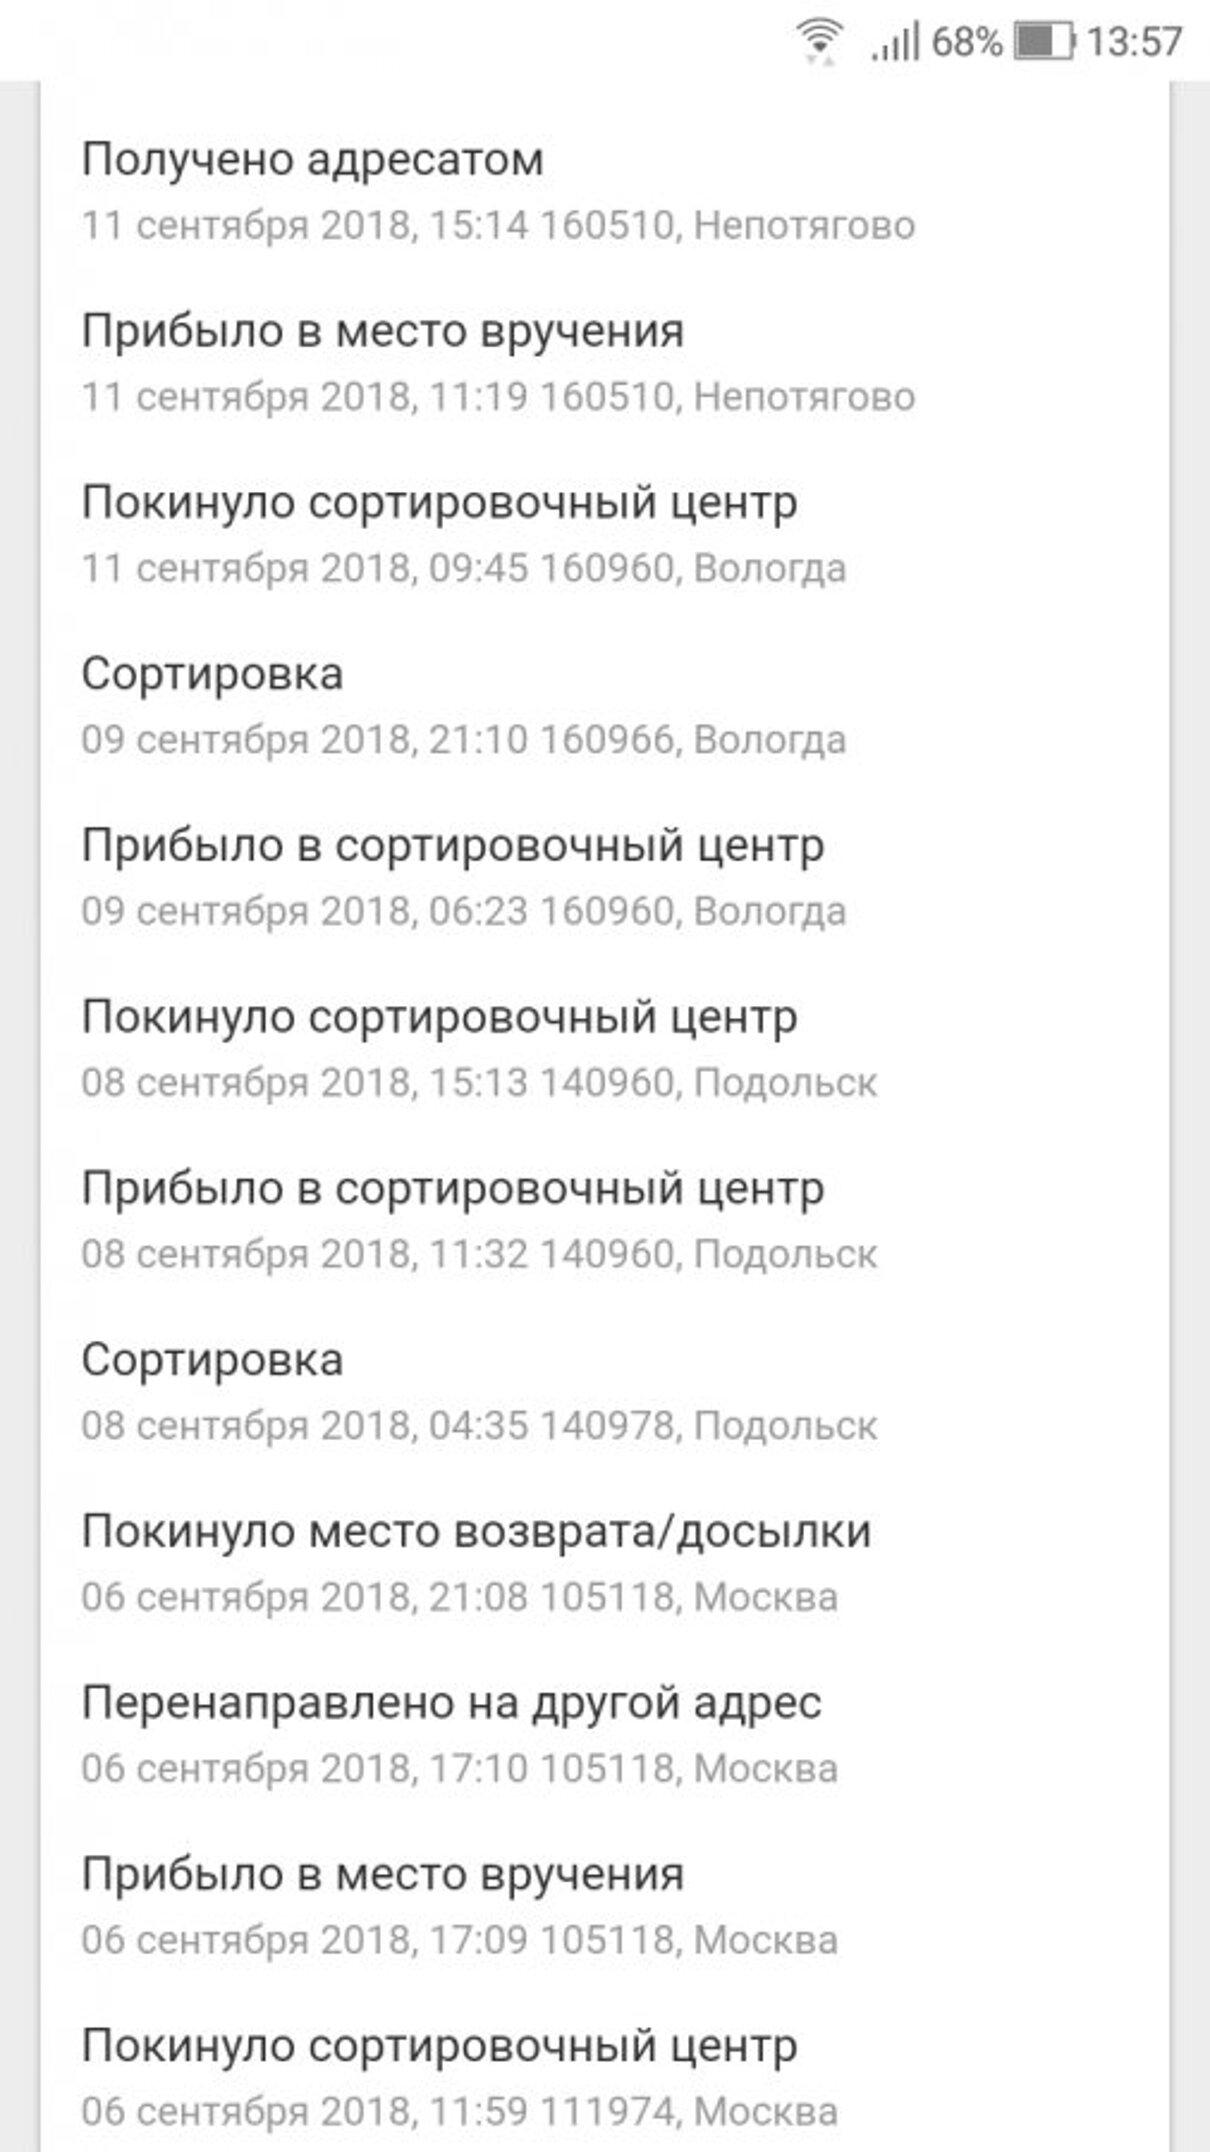 Жалоба-отзыв: ООО УСПЕХ Москва - Обман.  Фото №4